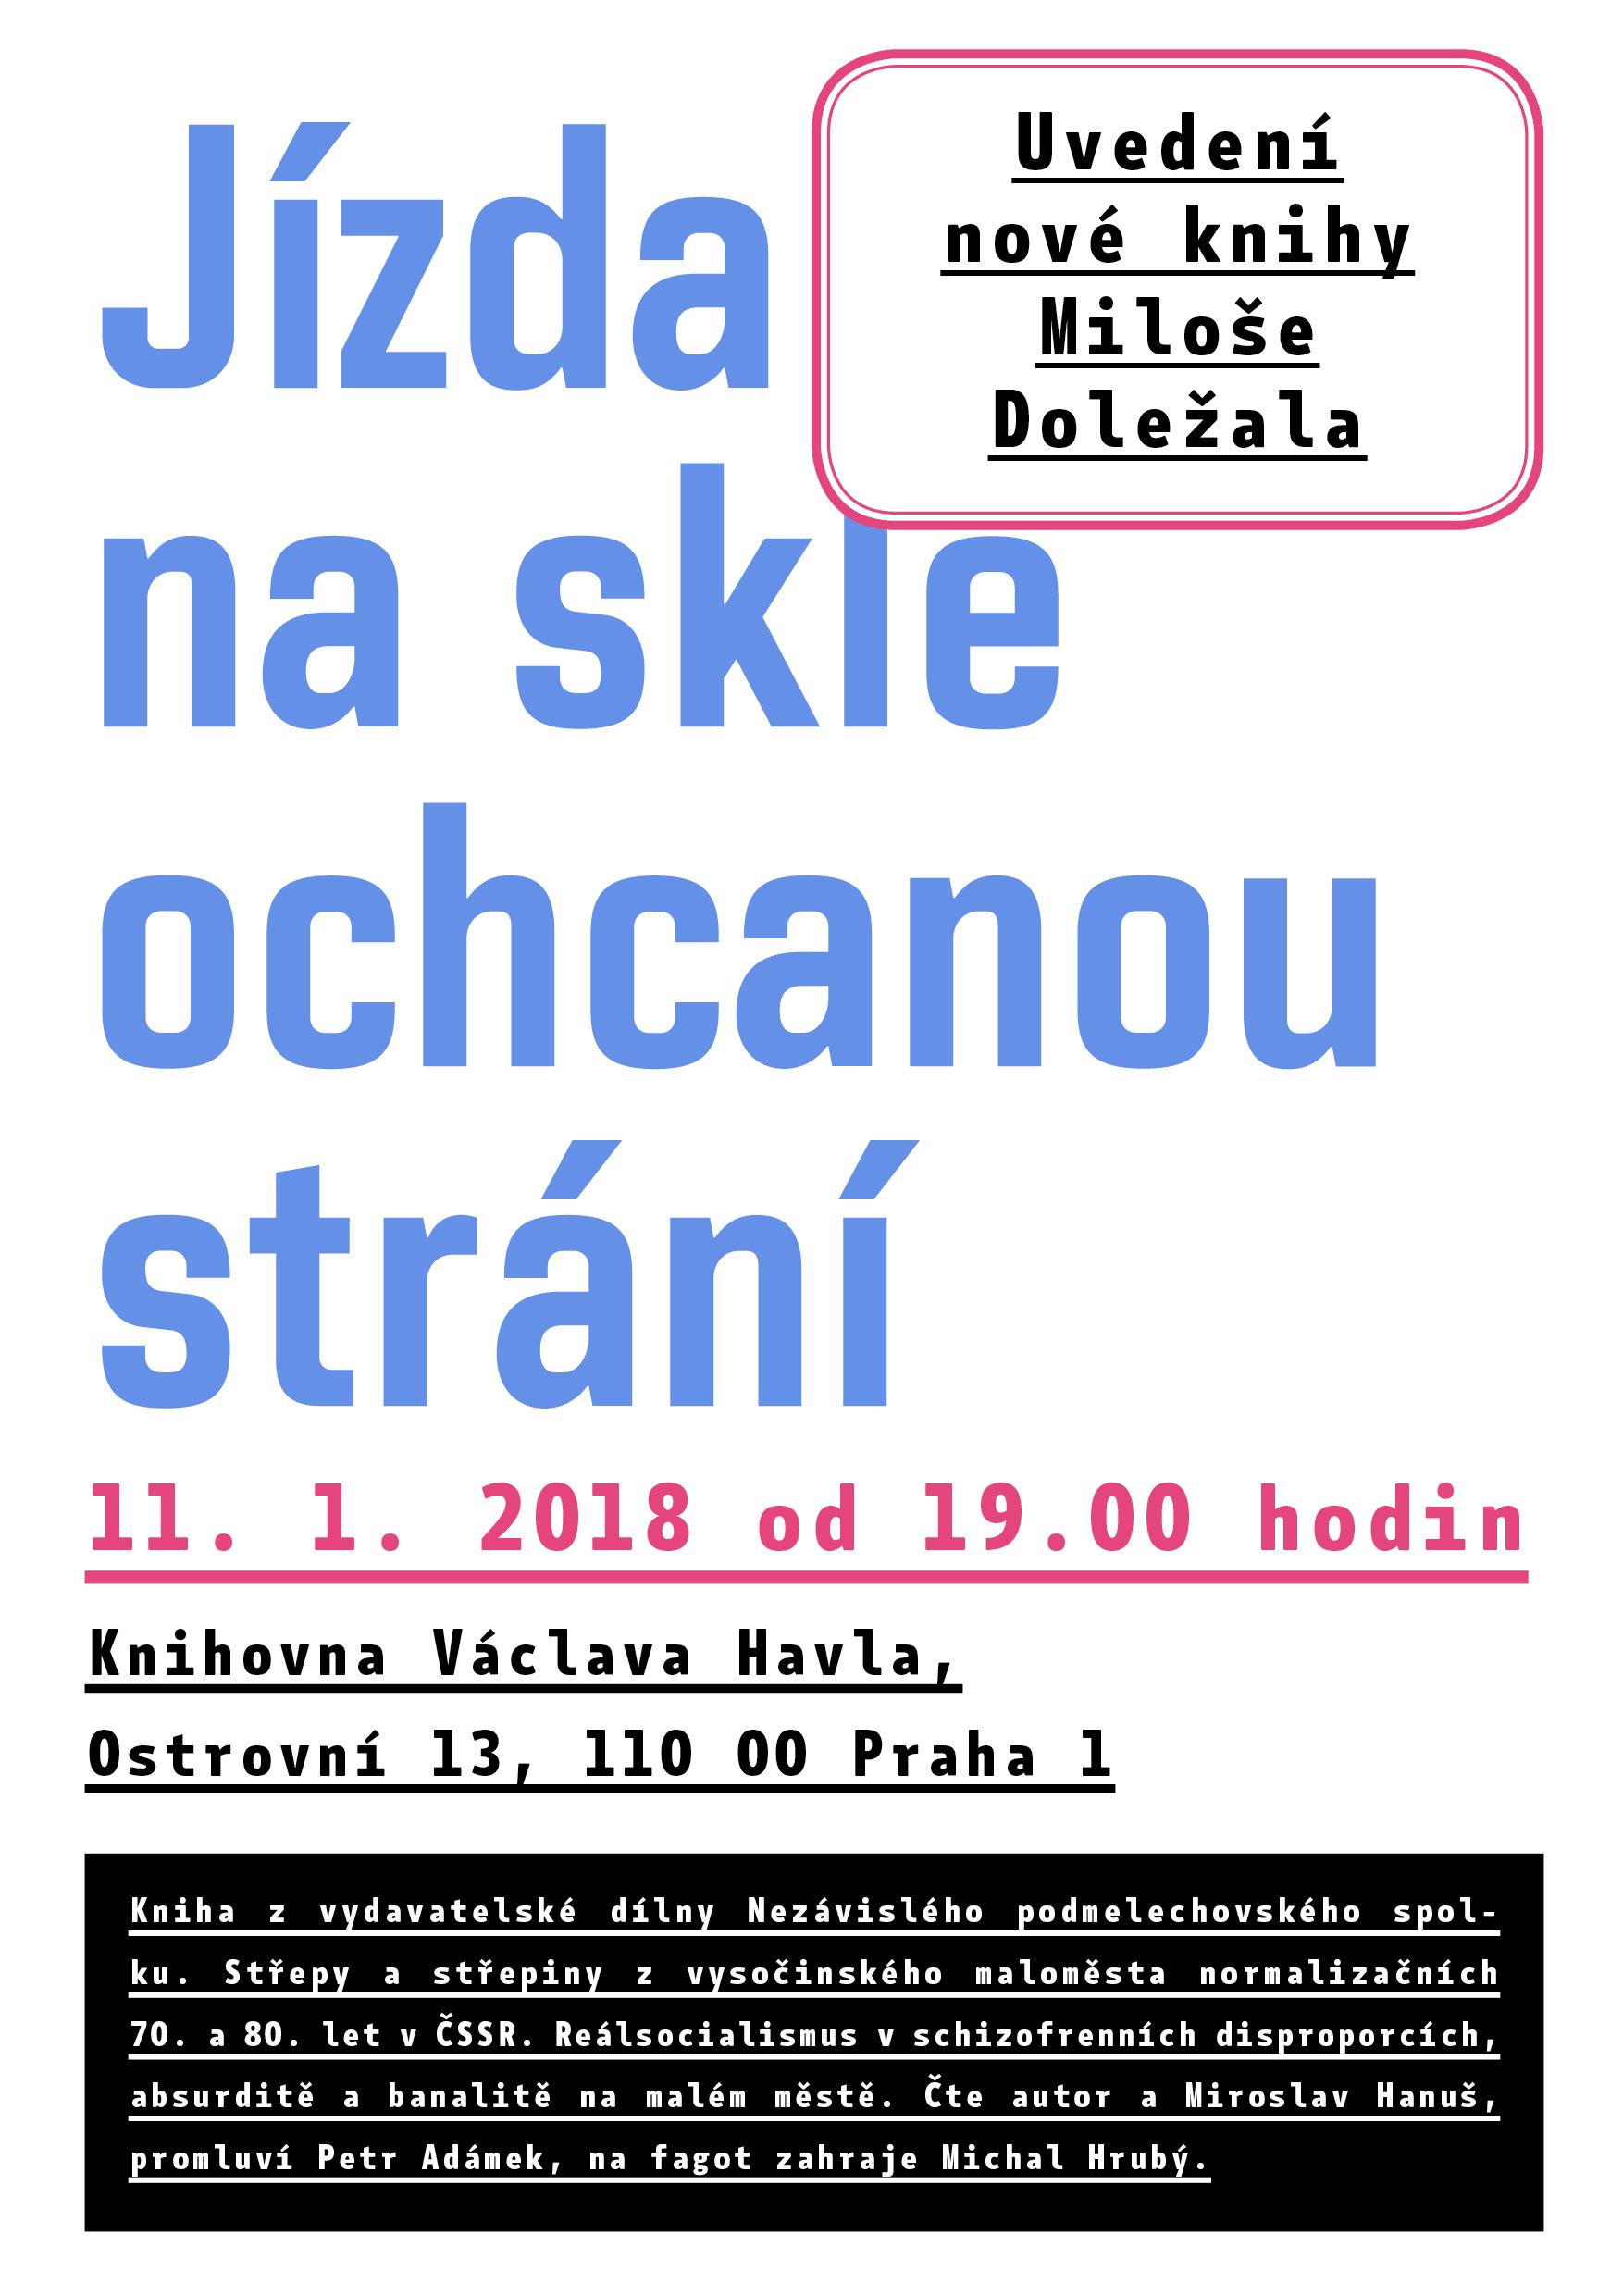 Uvedení nové knihy Miloše Doležala